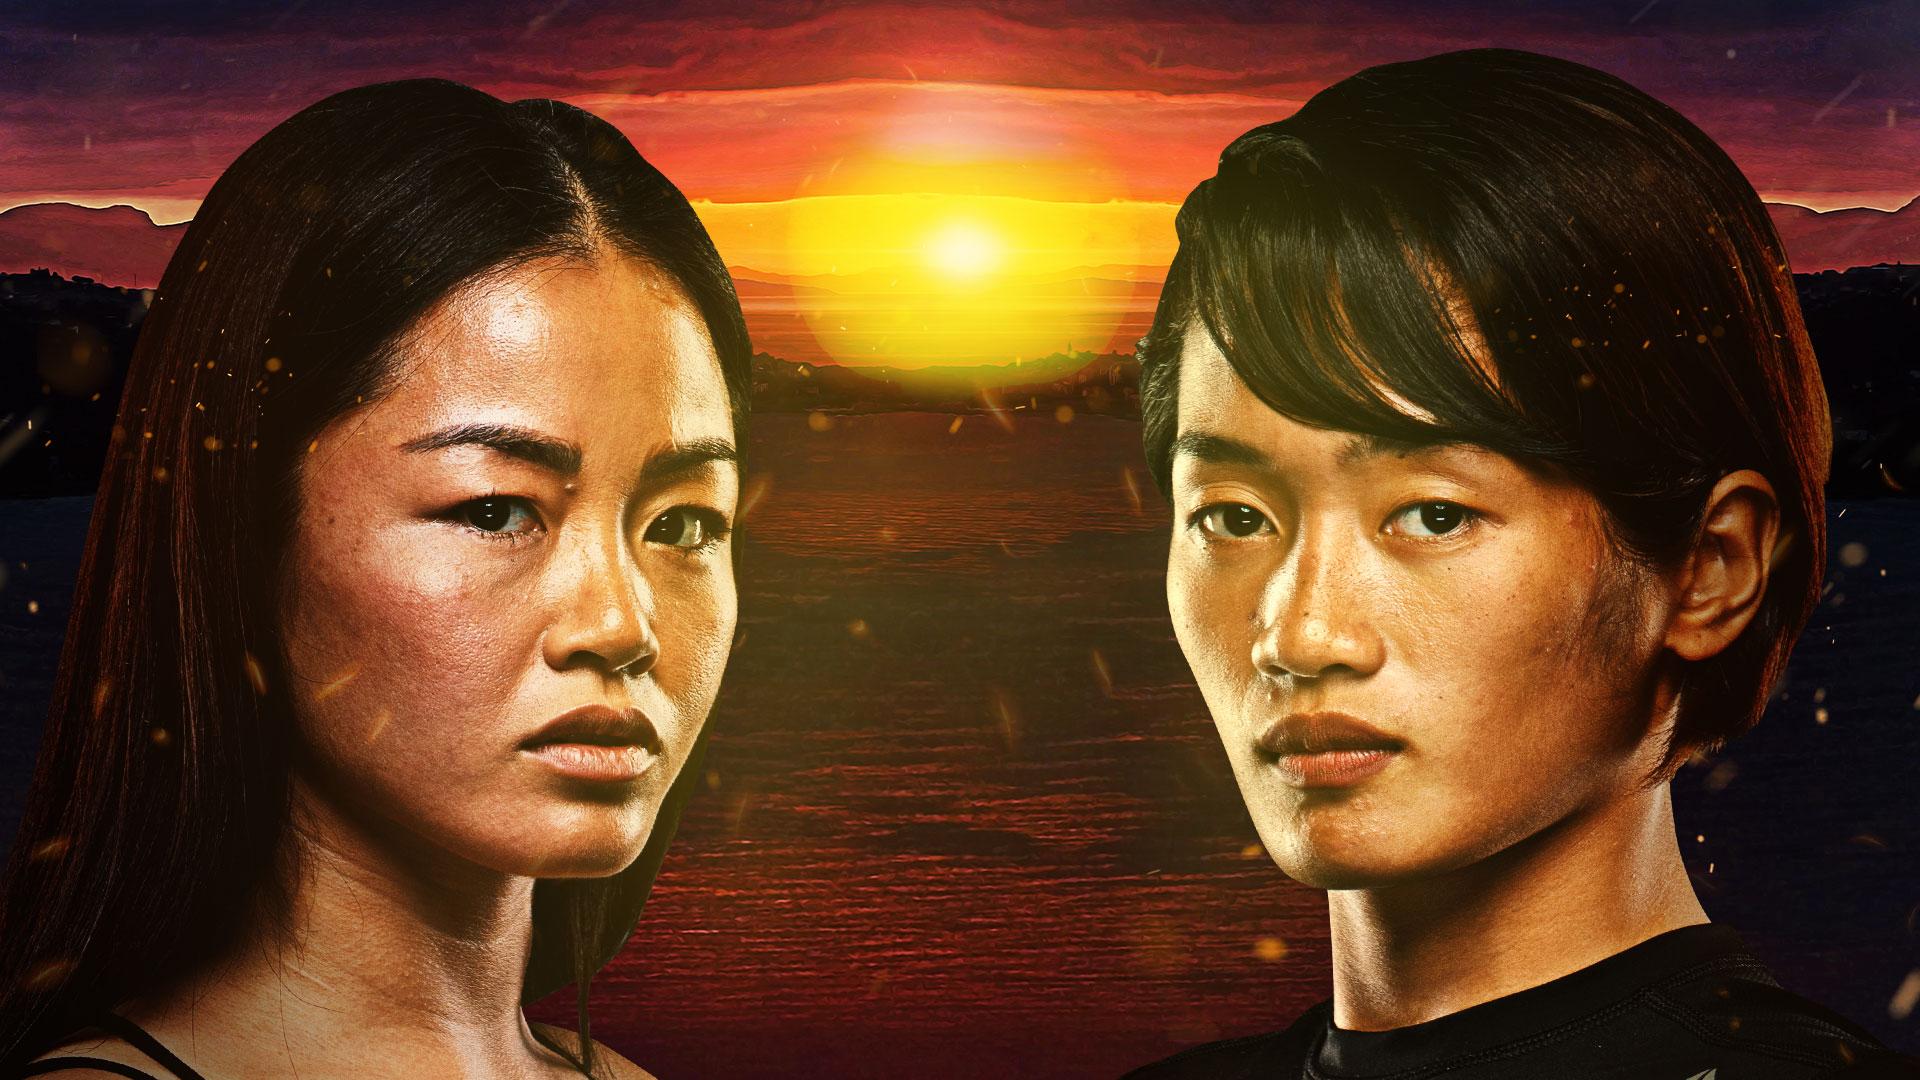 Bi Nguyen takes on Jenelyn Olsim at ONE: BATTLEGROUND III